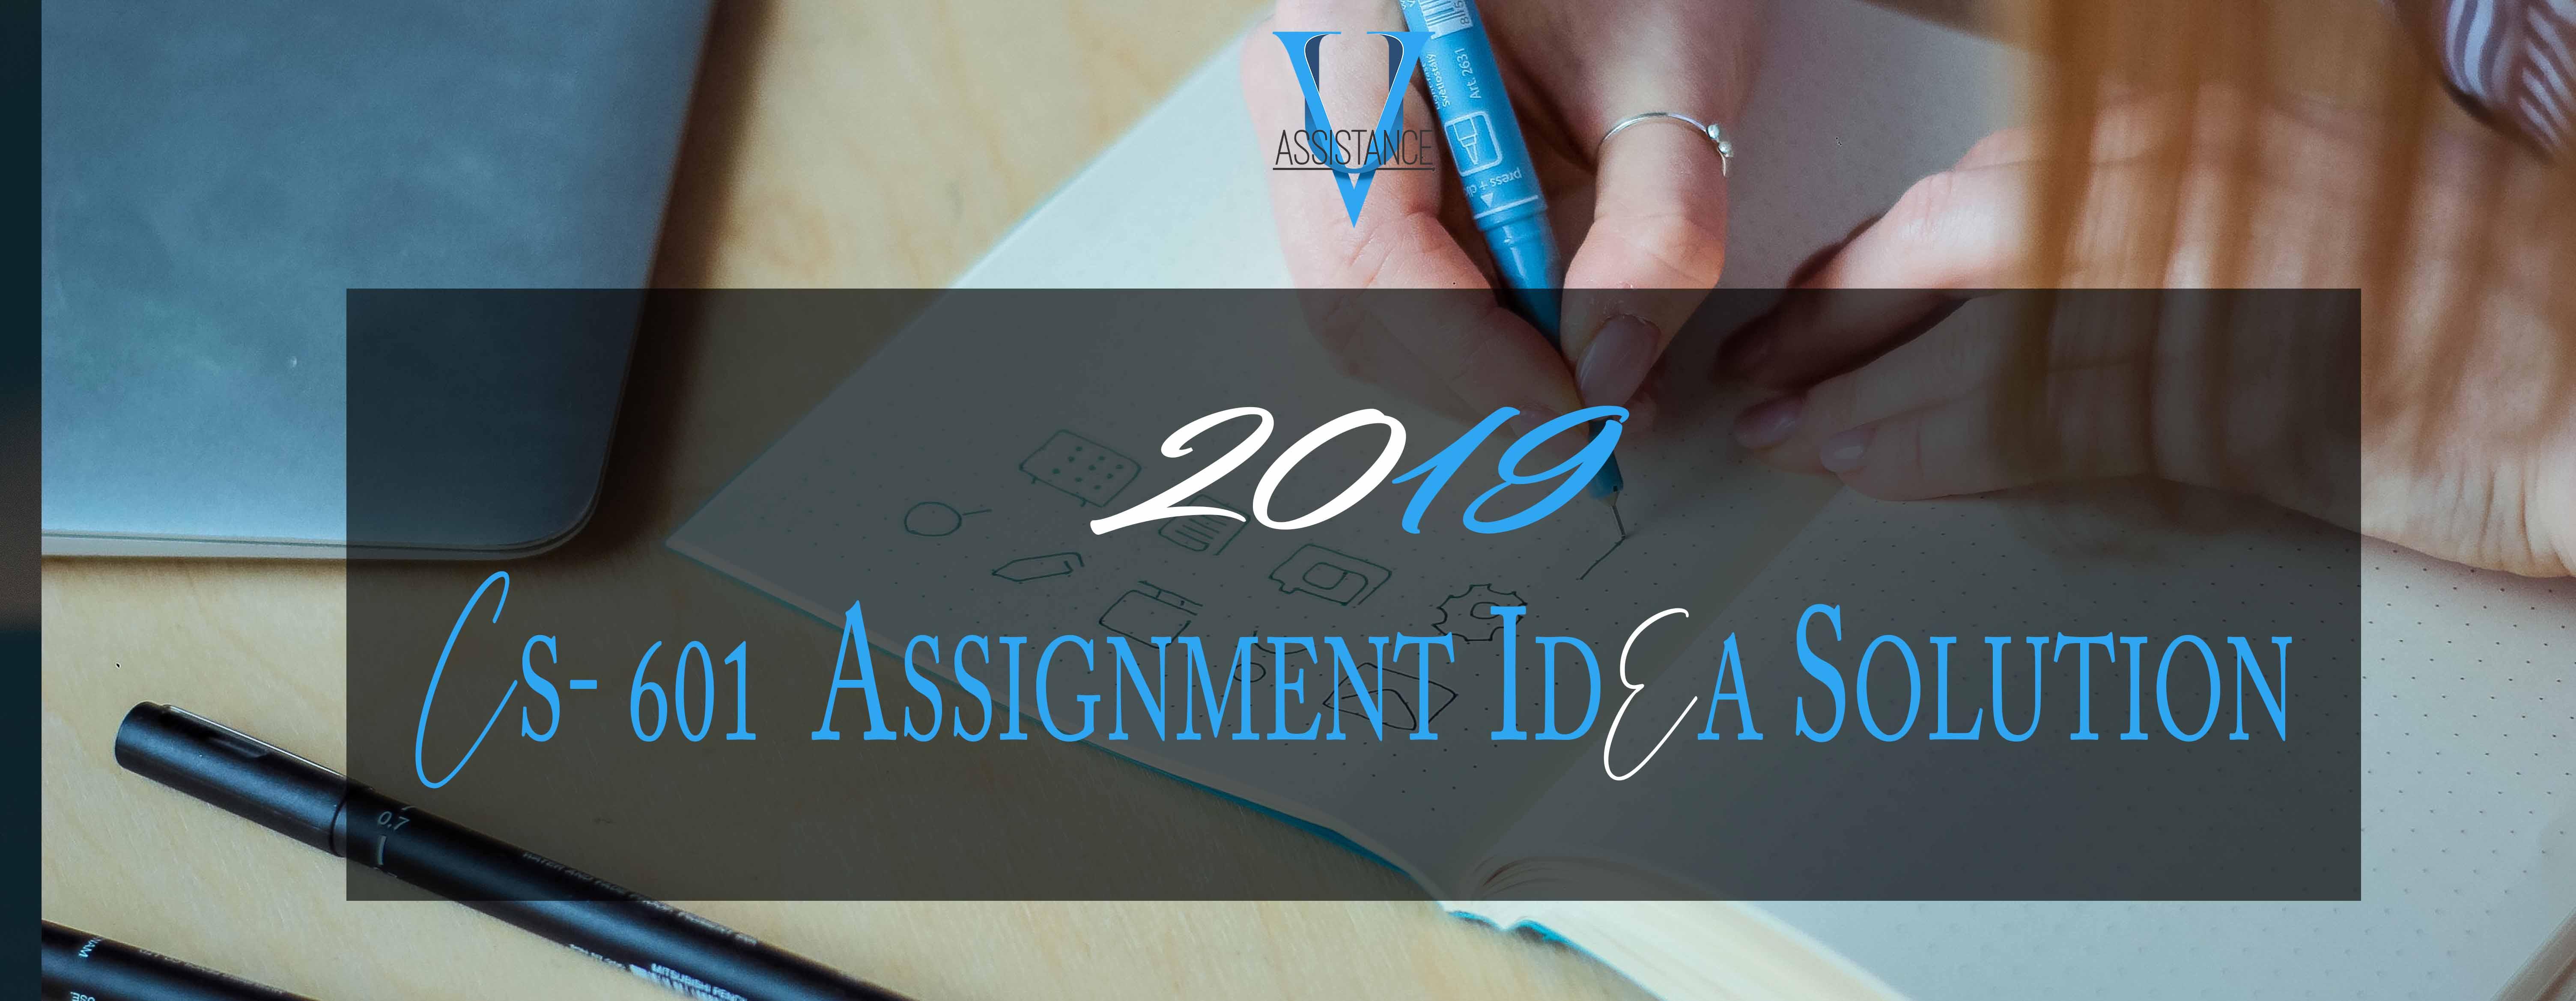 CS601 Assignment 1 Solution 2019